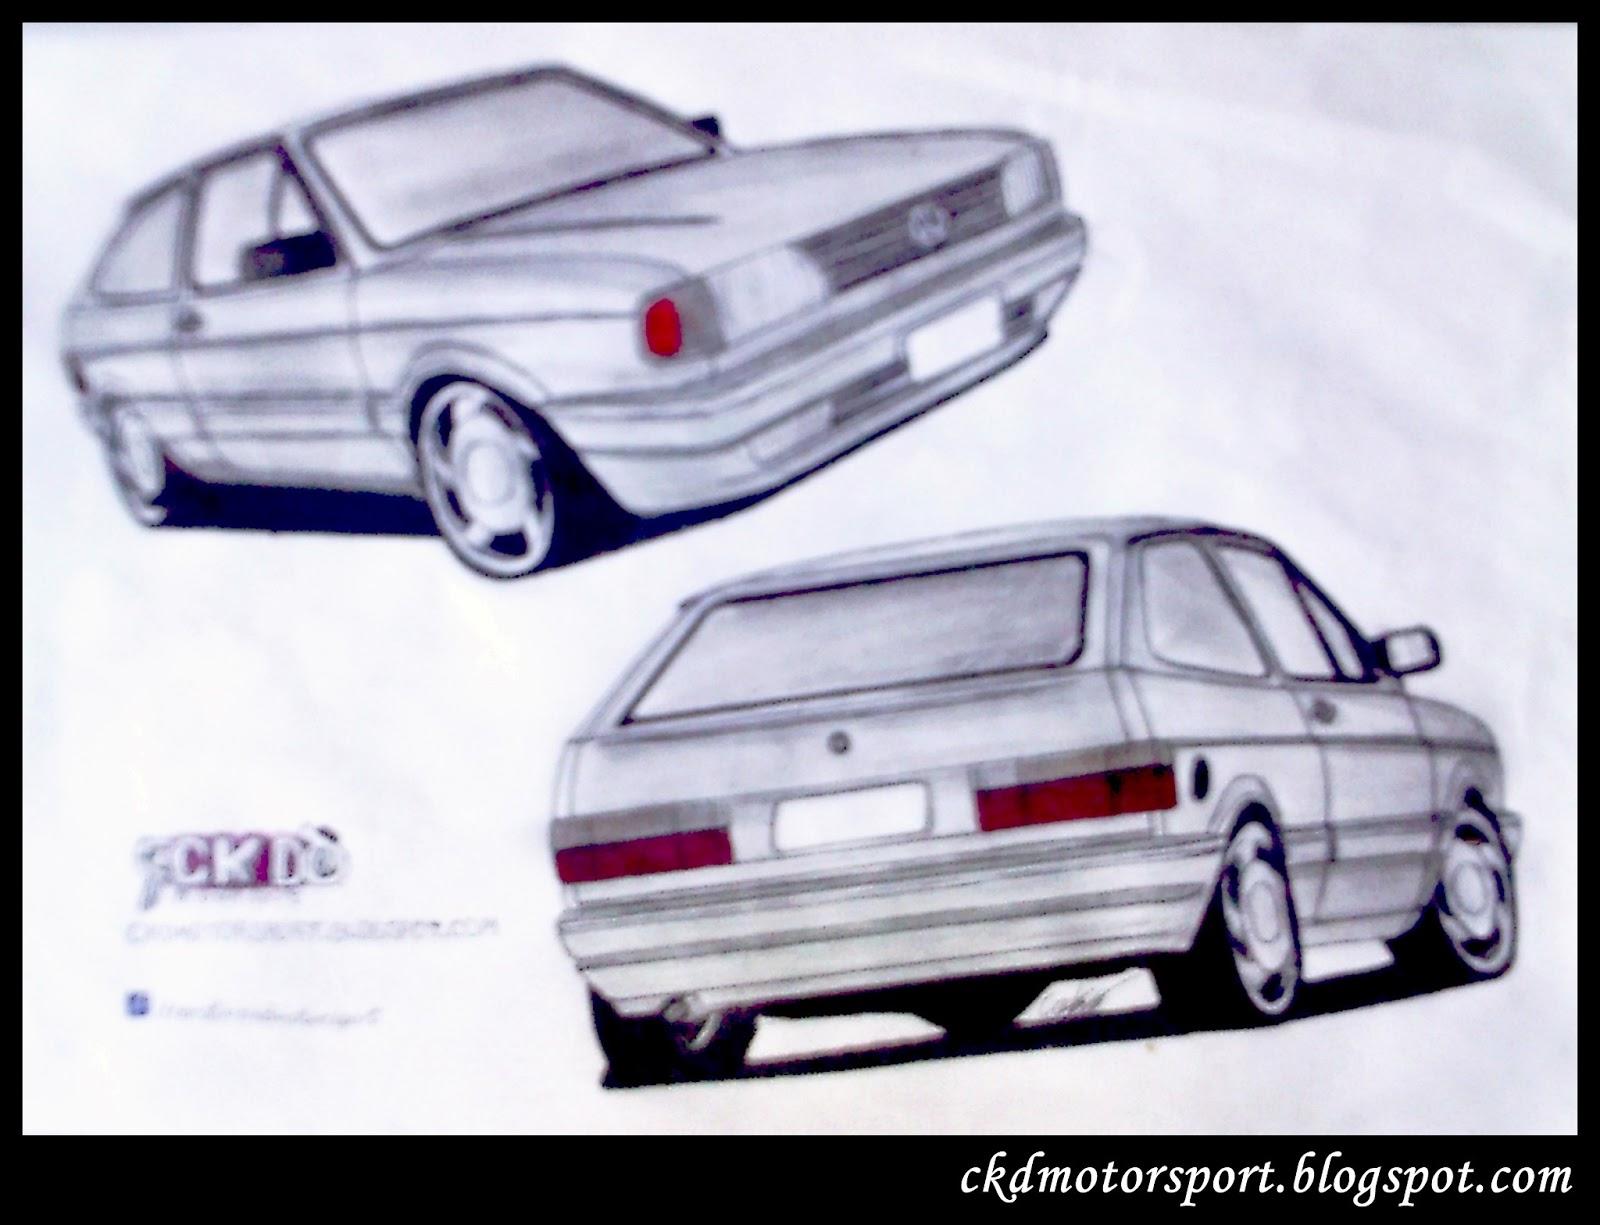 Ckd Motorsport Volkswagen Gol O Quadrado Desejado